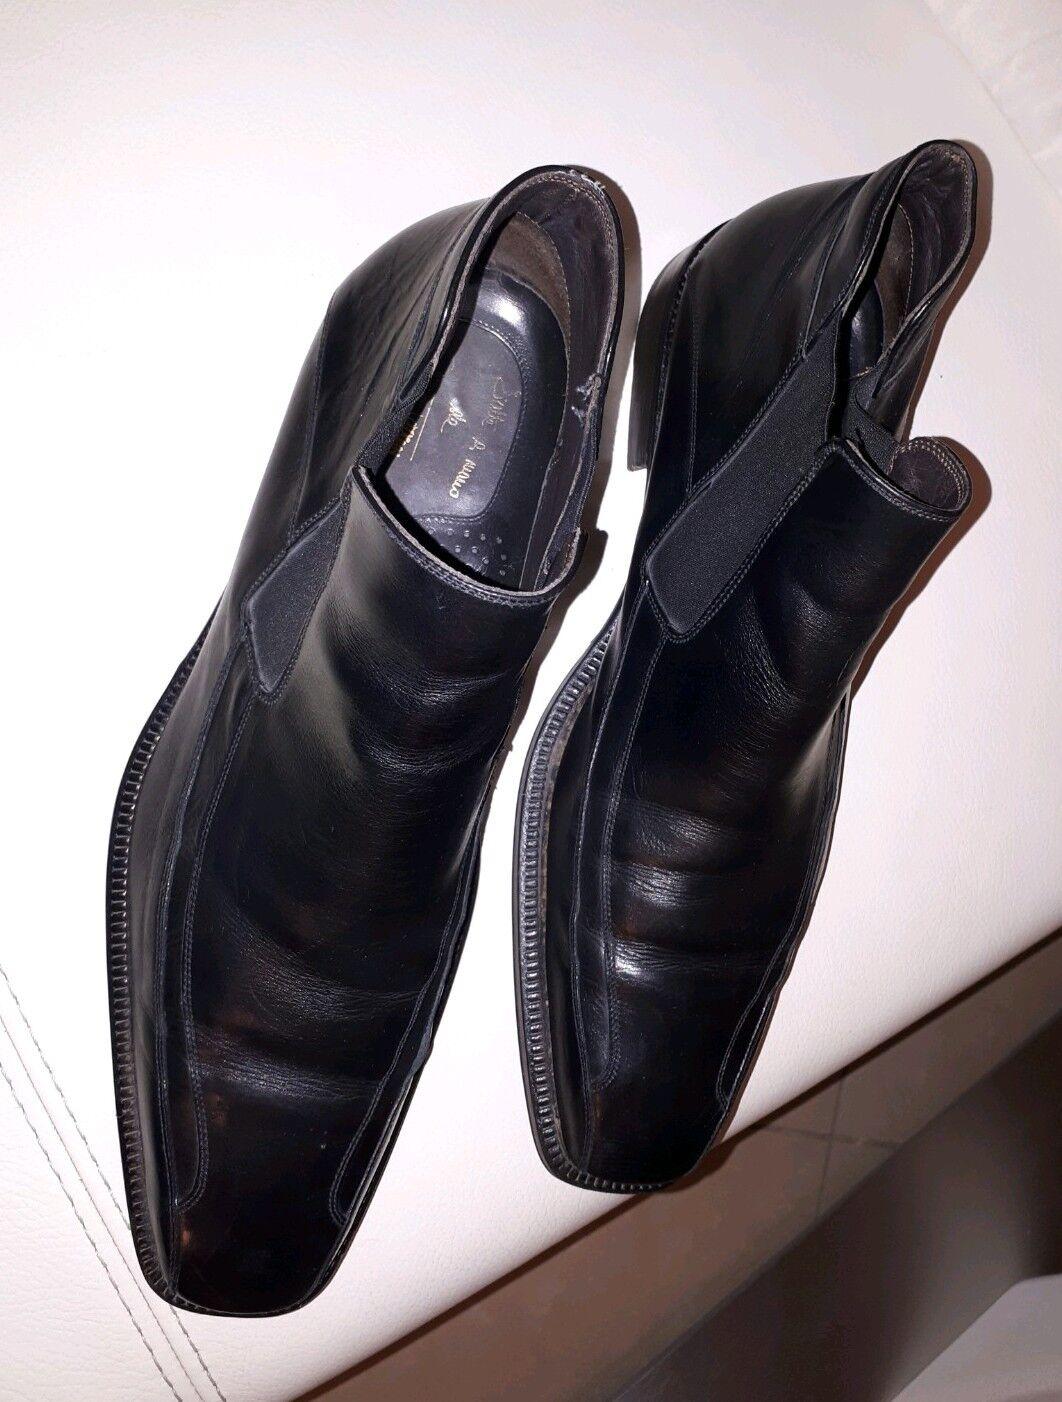 Galizio Toressi Herren Halbschuhe Schuhe Stiefel Gr. 45 Echtleder    | Genial